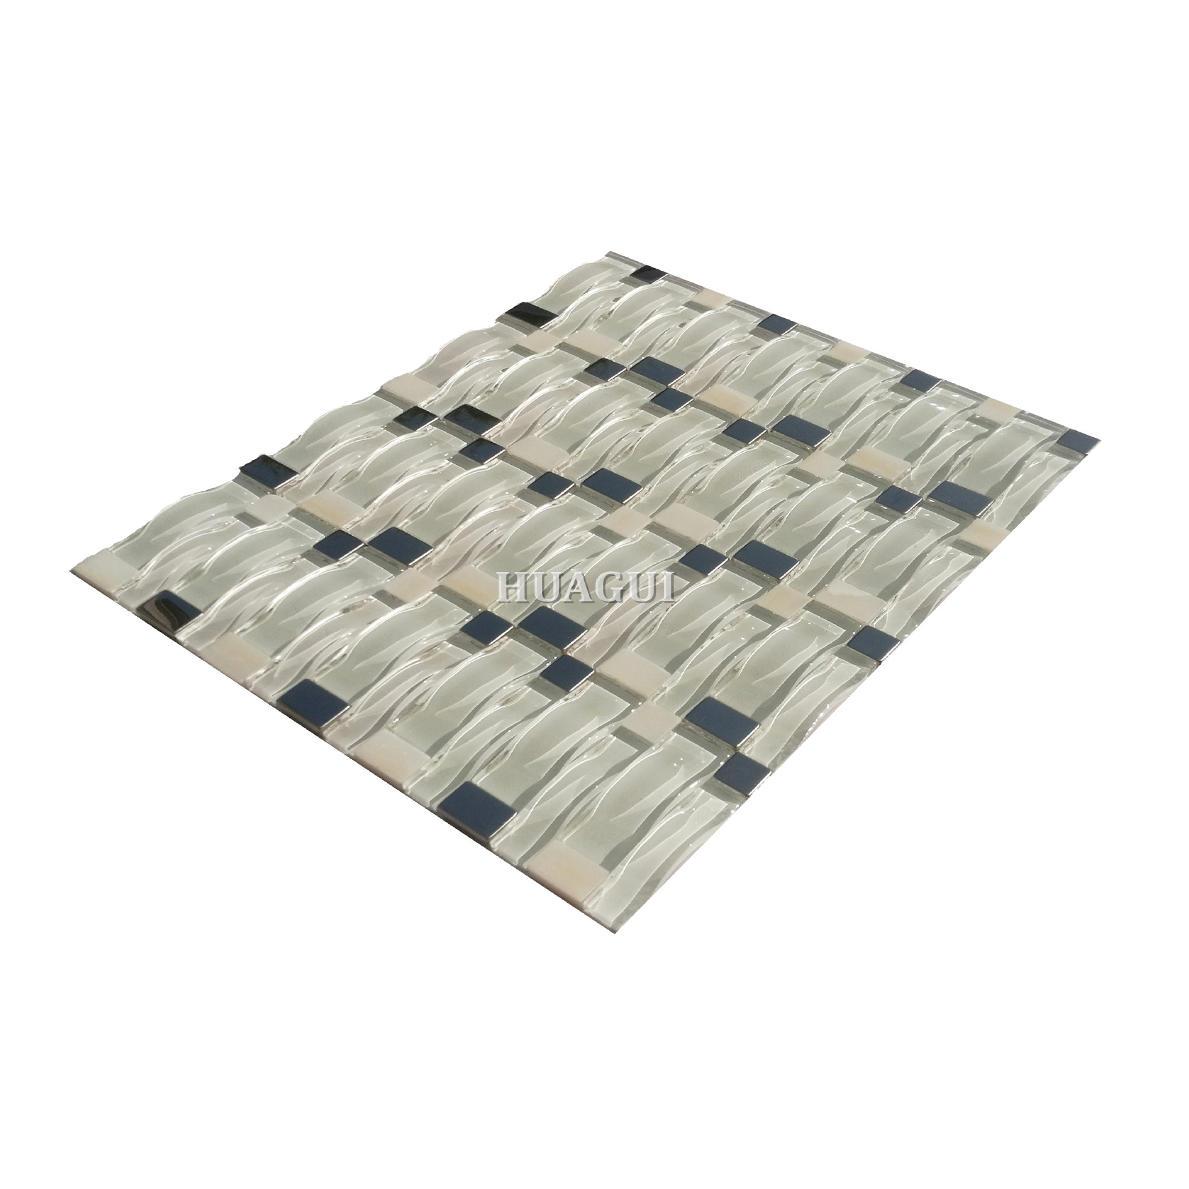 White waving glass metal tile for light color bathroom wall backsplash design